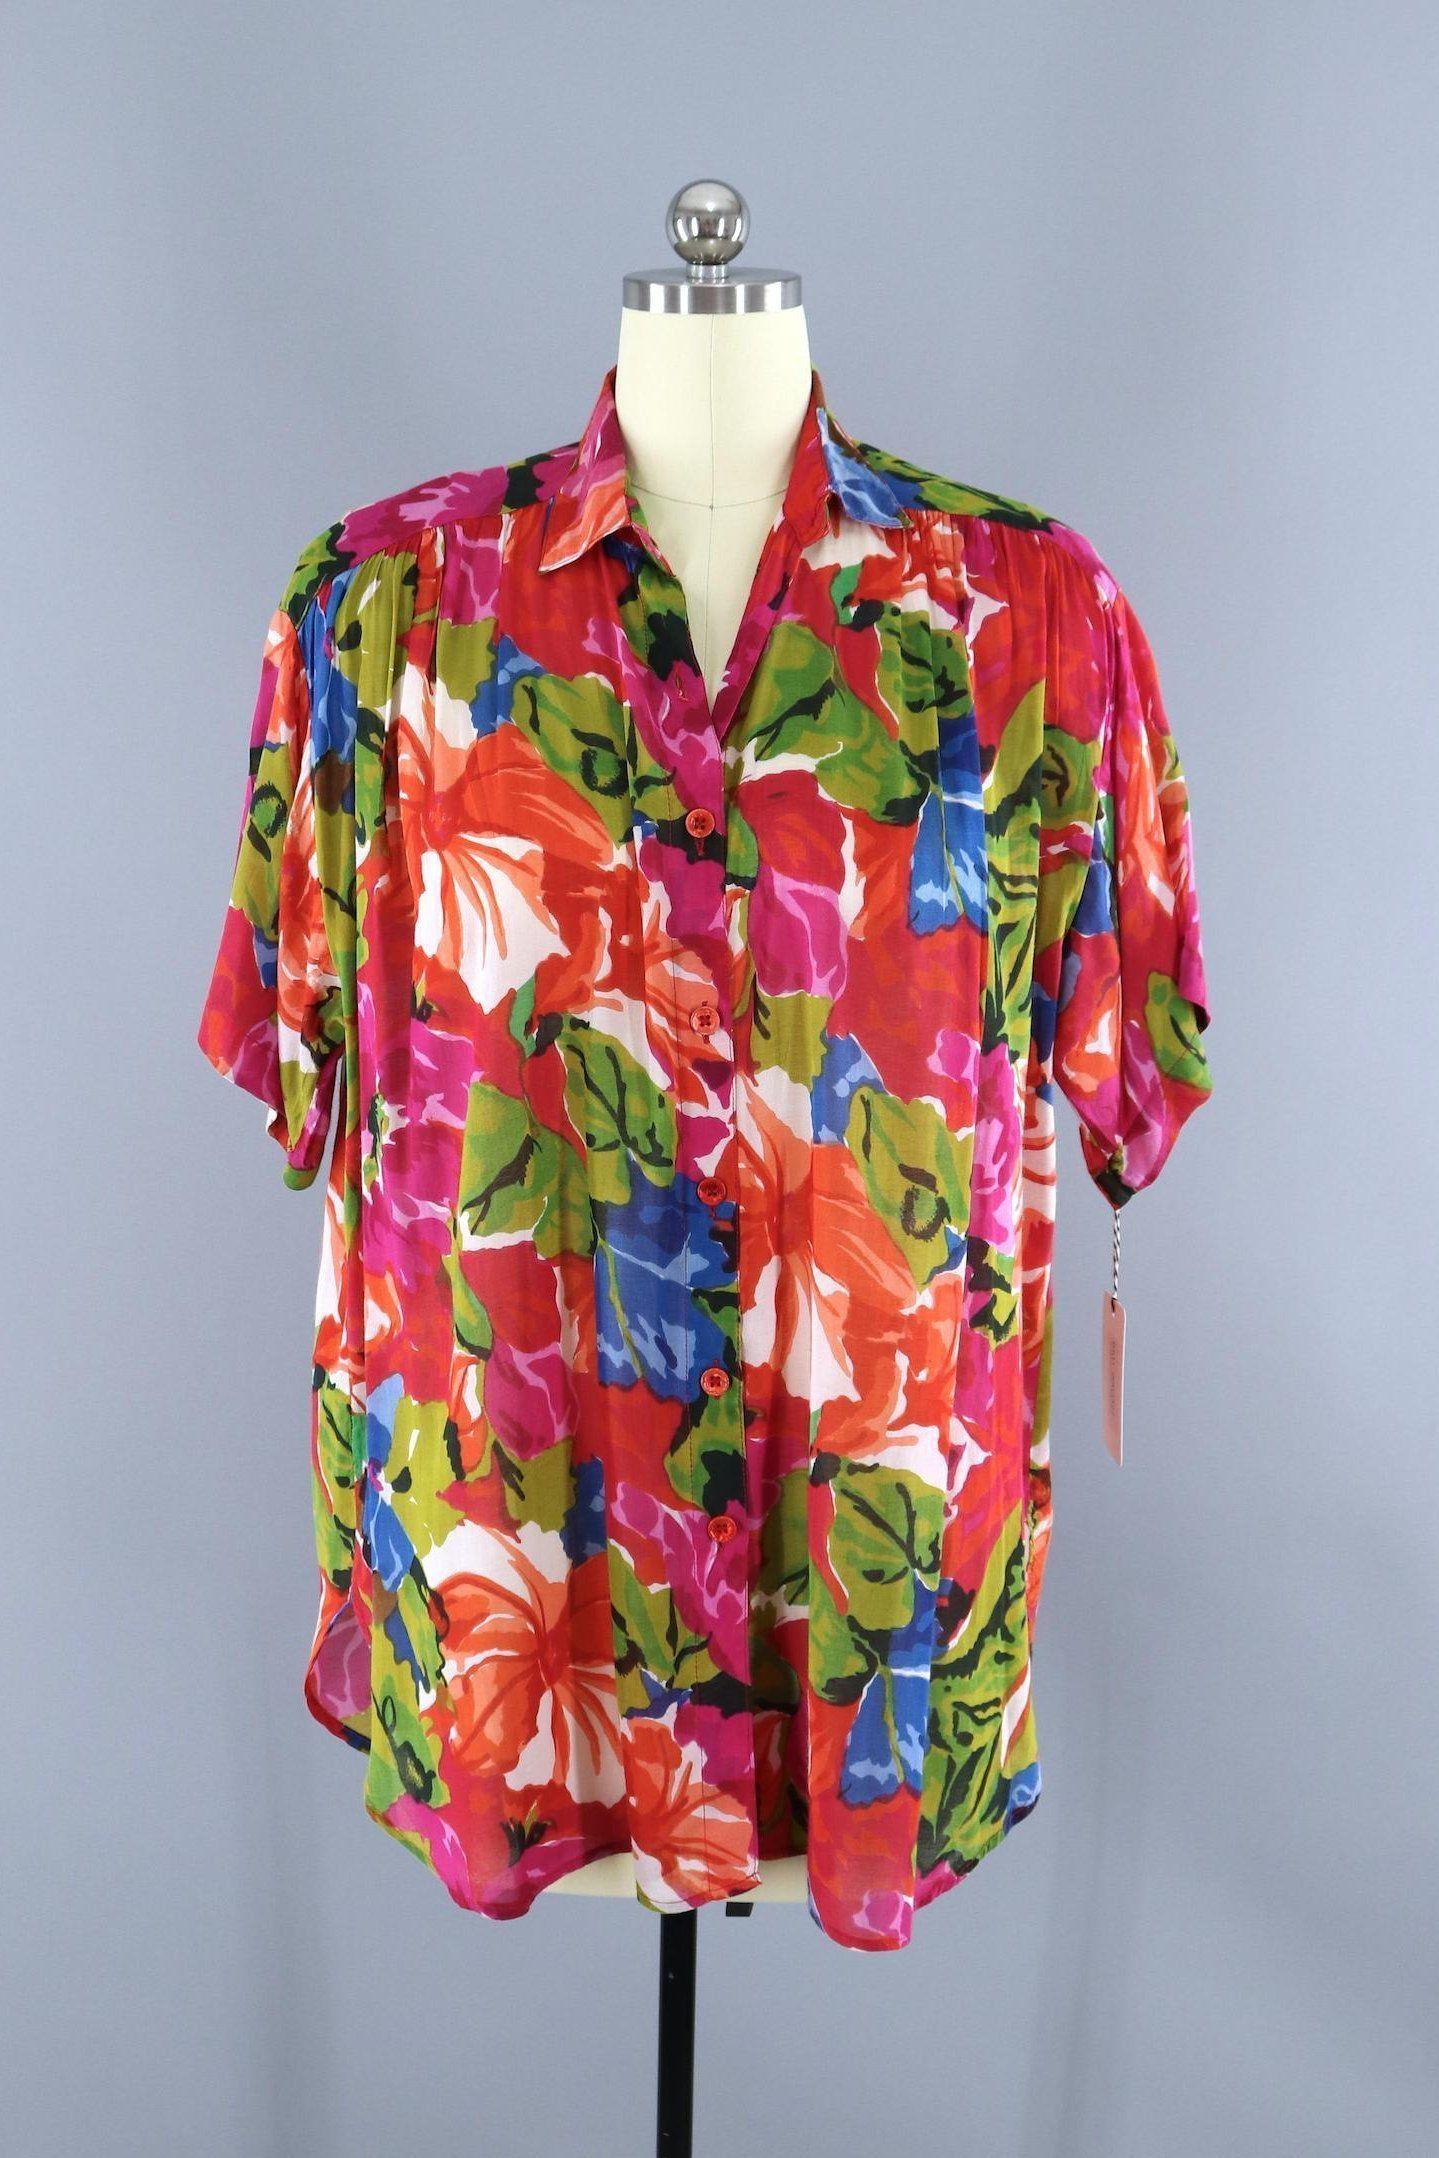 9625743d5e7ee Vintage 1980s Floral Print Shirt   Indian Cotton Gauze Shirt  thisbluebird.com  tops  vintagetop  vintagetops  vintage  blouse  blouses   shirt  shirts ...